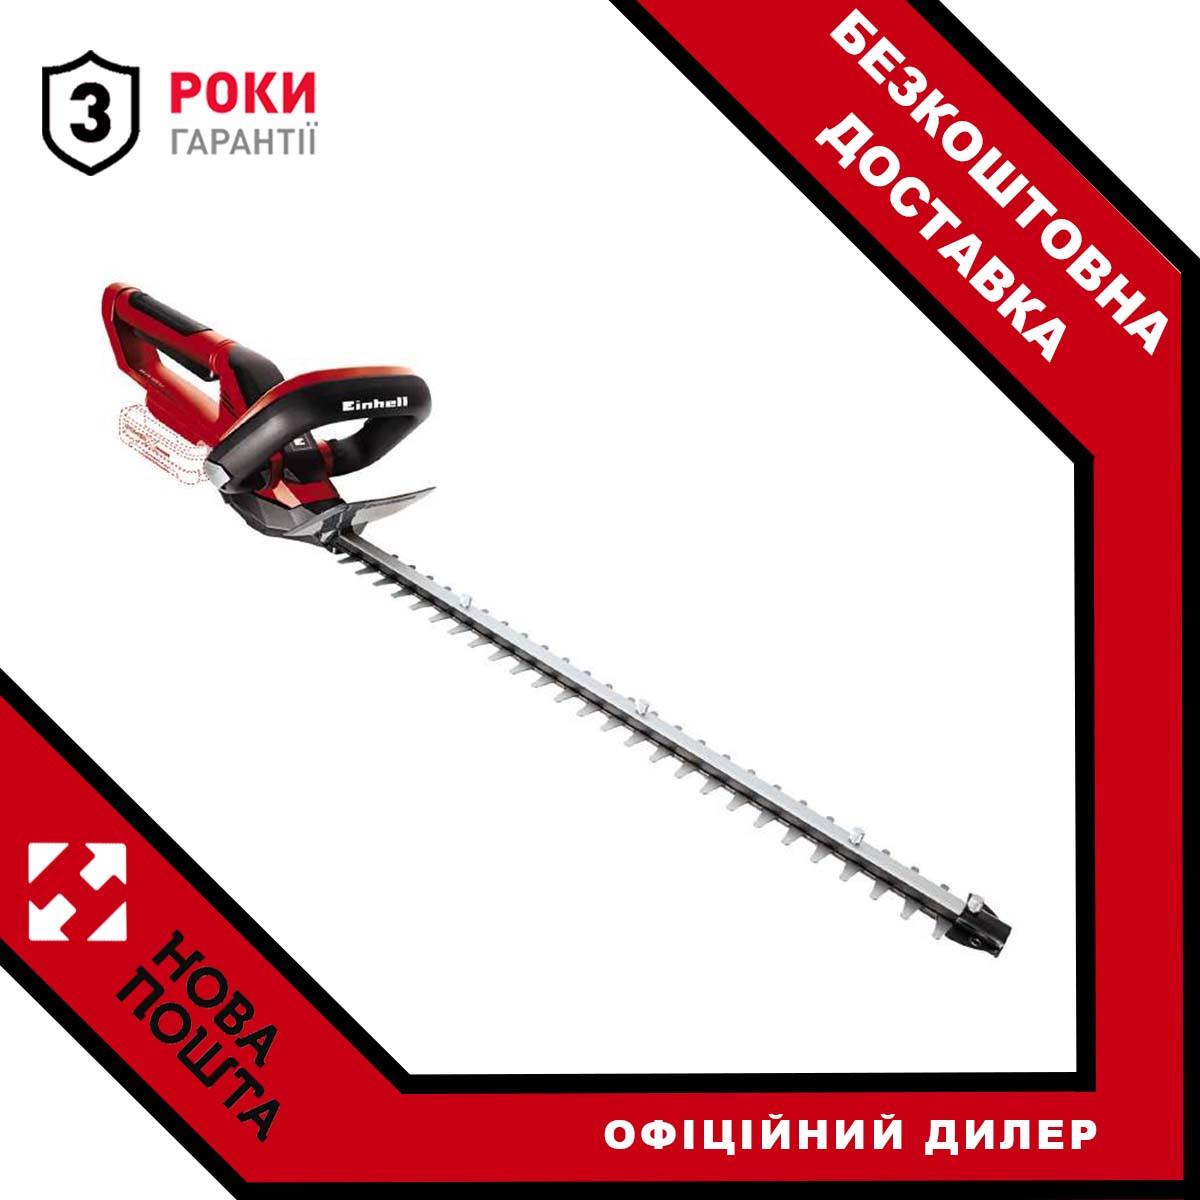 Кусторез аккумуляторный Einhell GE-CH 1855/1 Li Solo